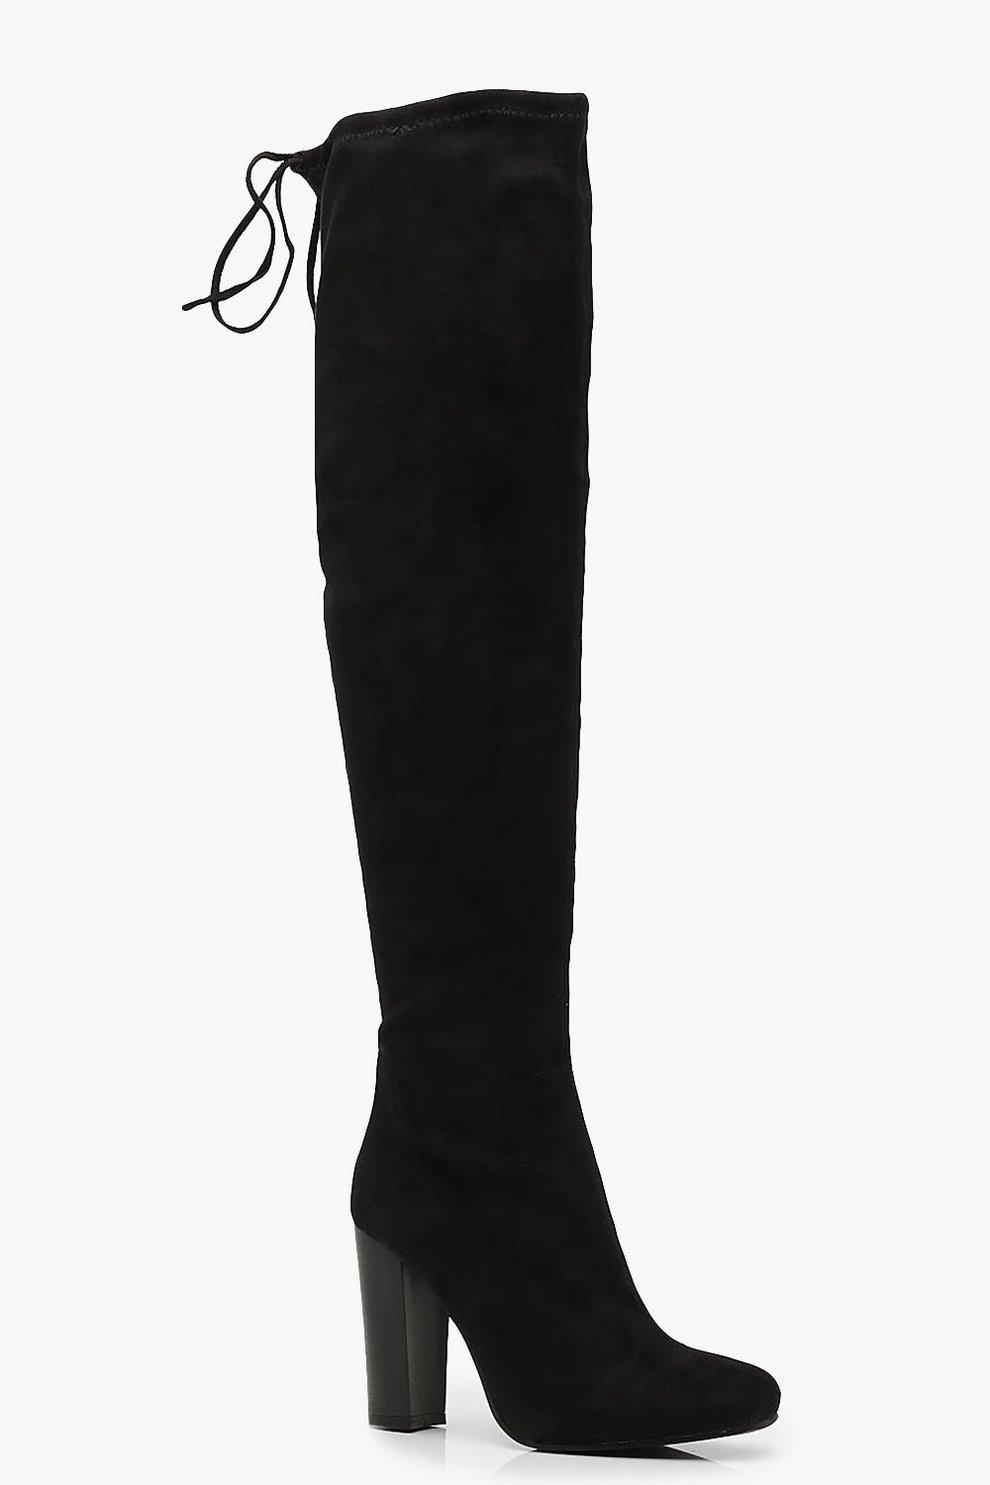 e15fce98363e Tie Back Block Heel Over the Knee Boots